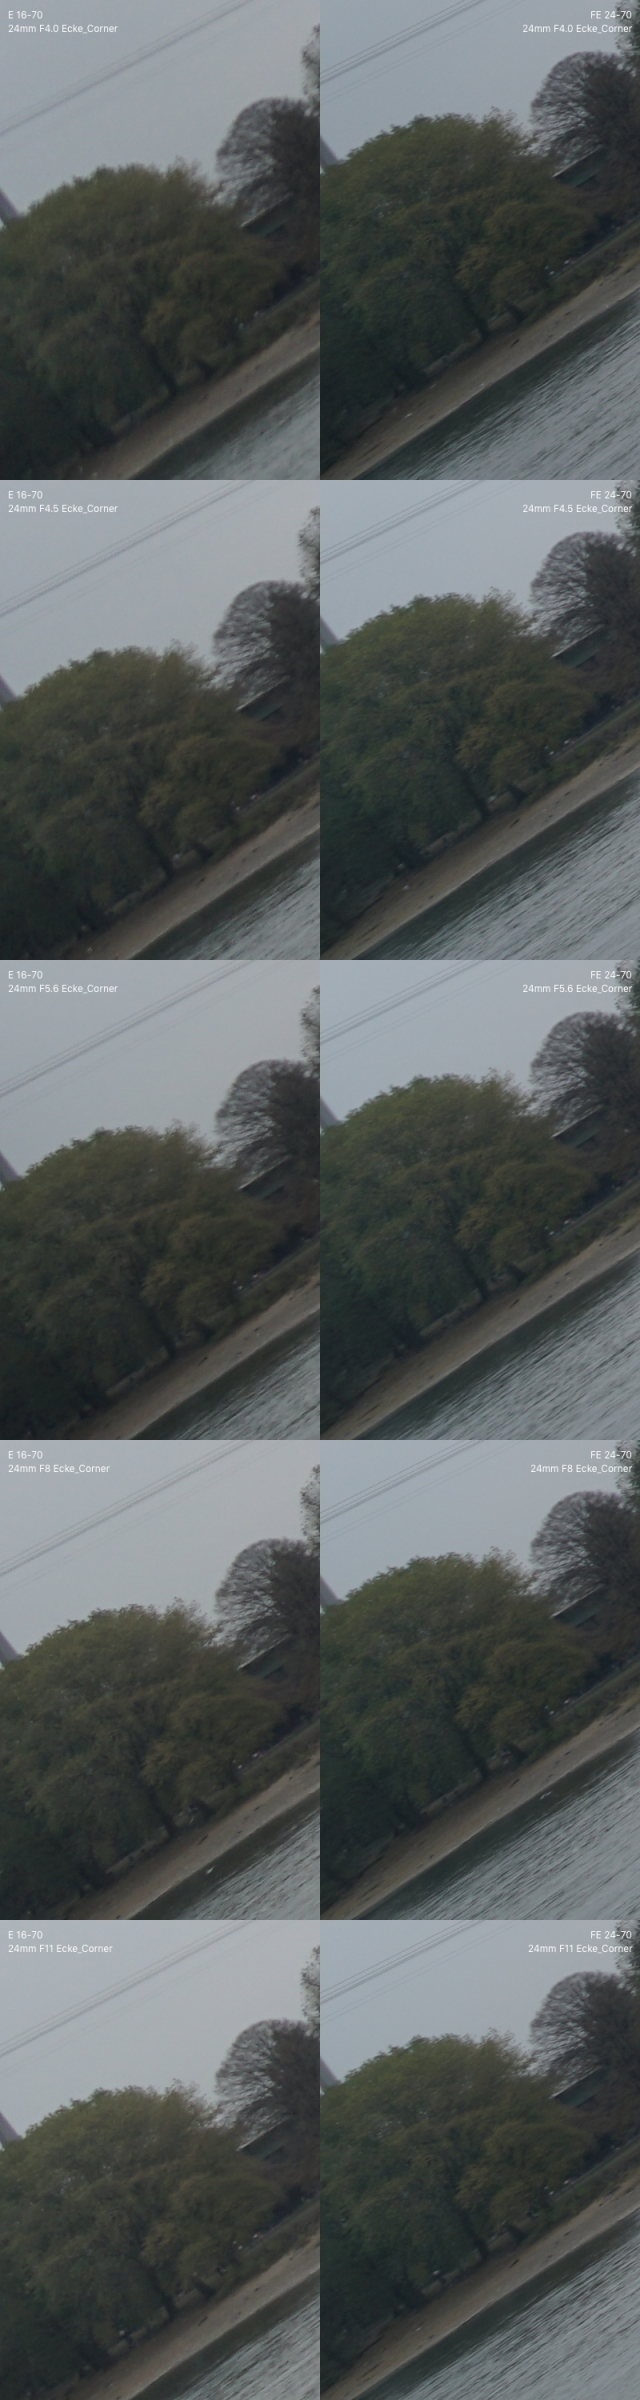 24mm-f4-0-f11-ecke_corner